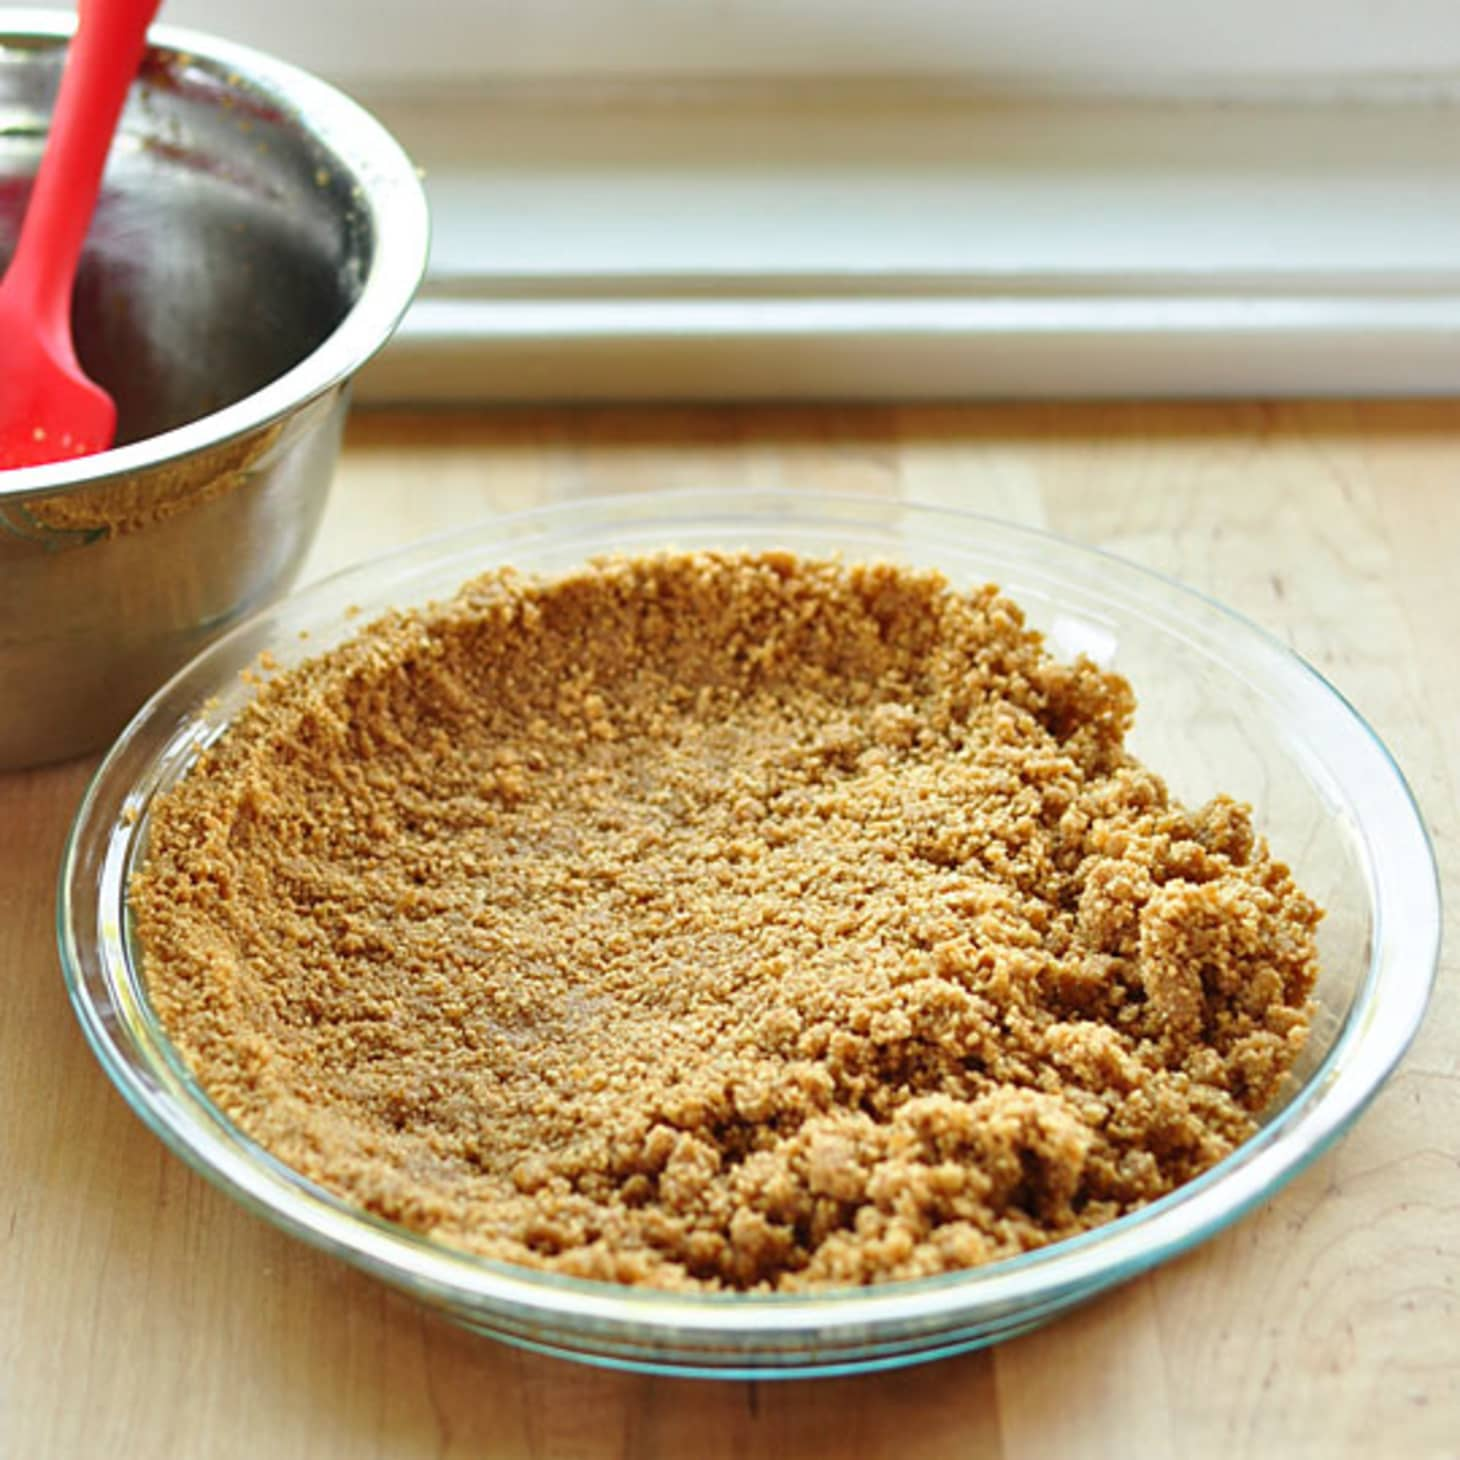 how to make graham cracker crust not crumble